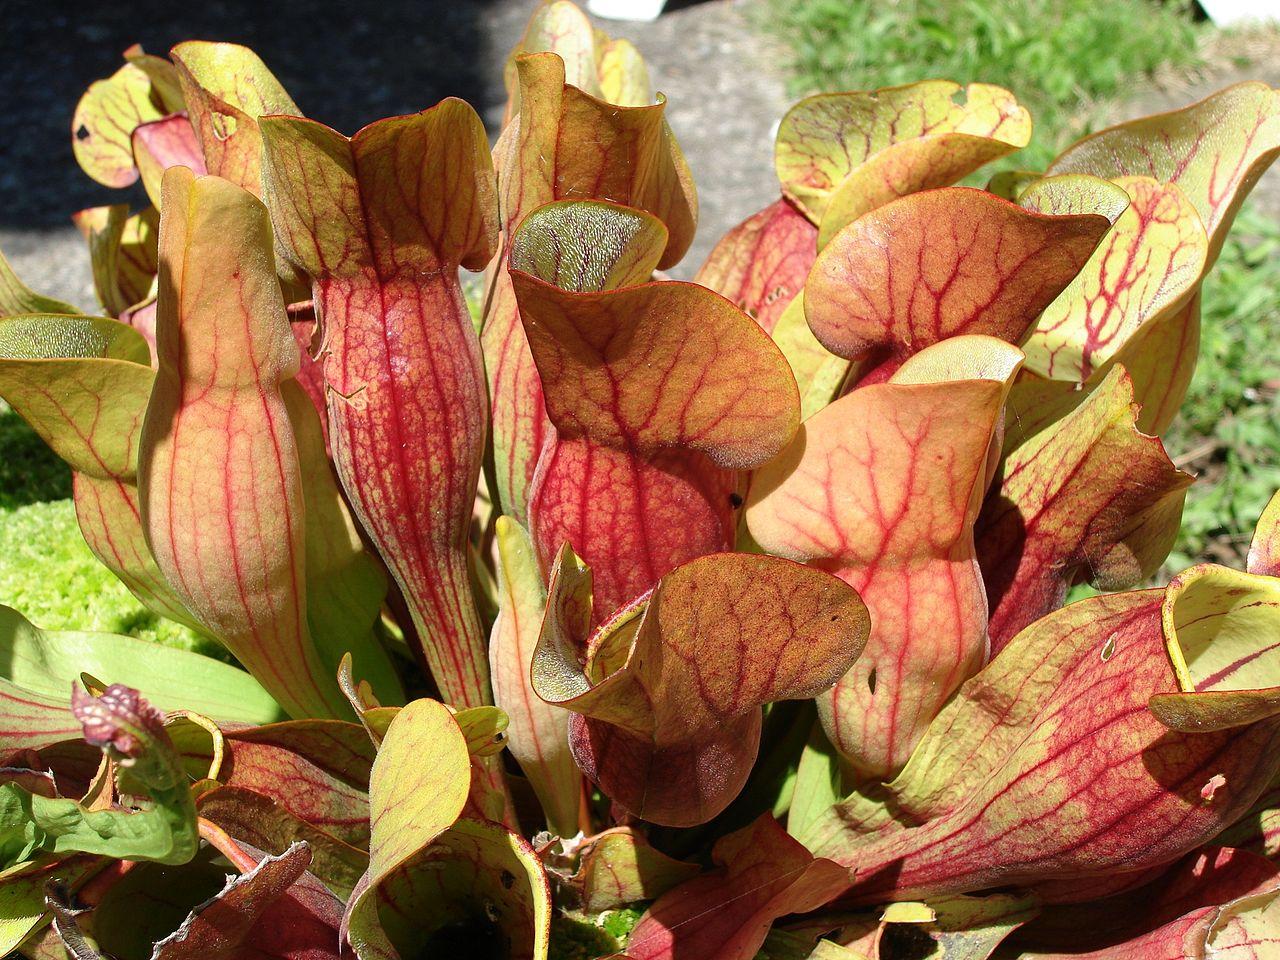 La Sarracenia purpurea es una carnívora rojiza